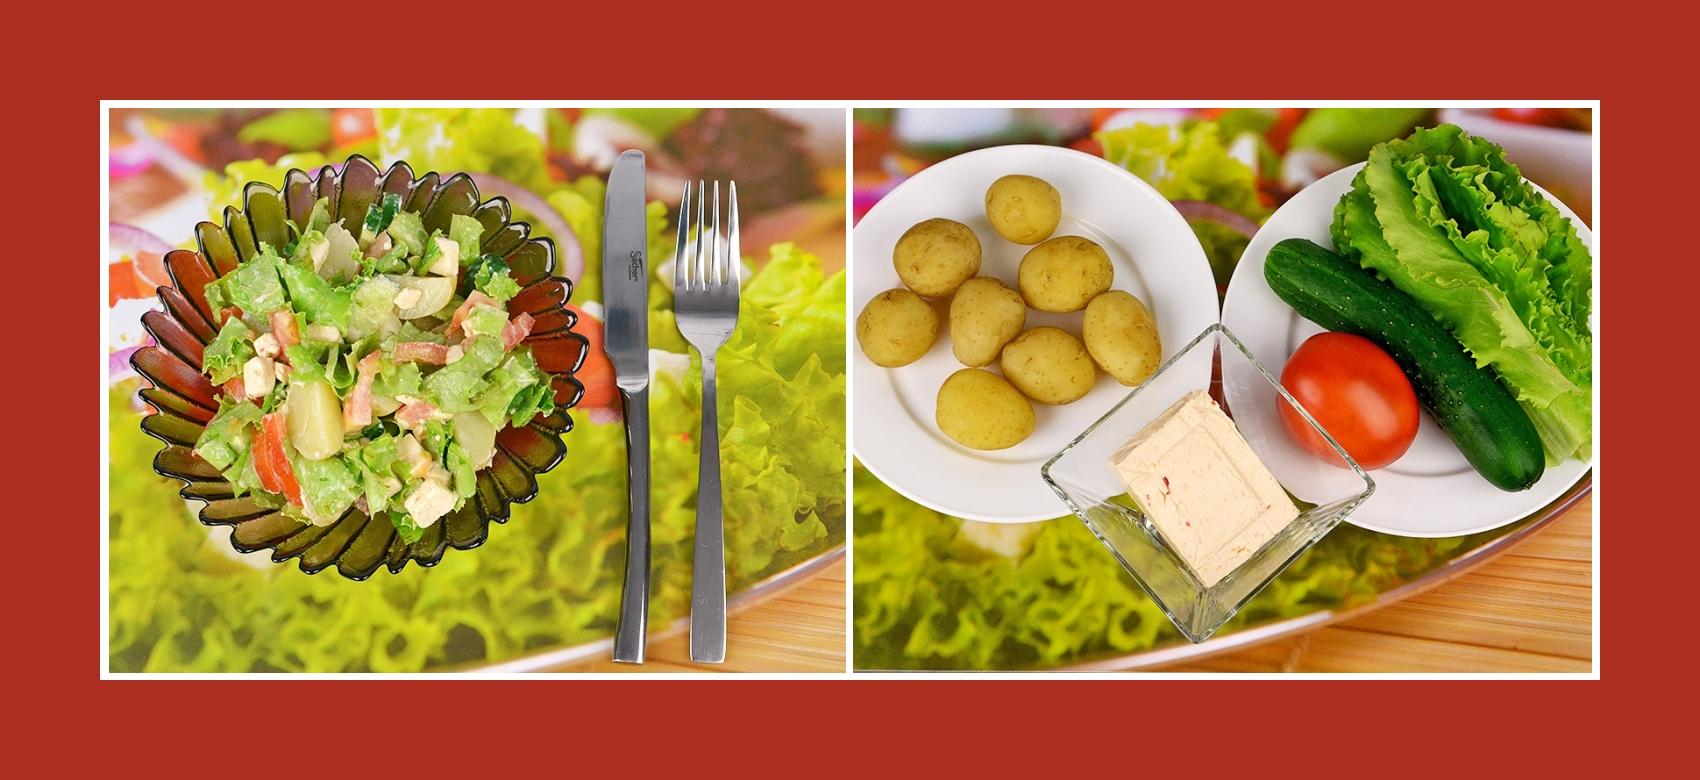 Saftiger Gemüsesalat mit Kartoffeln, Tomaten, Gurken, Gartensalat und pikantem Schmelzkäse